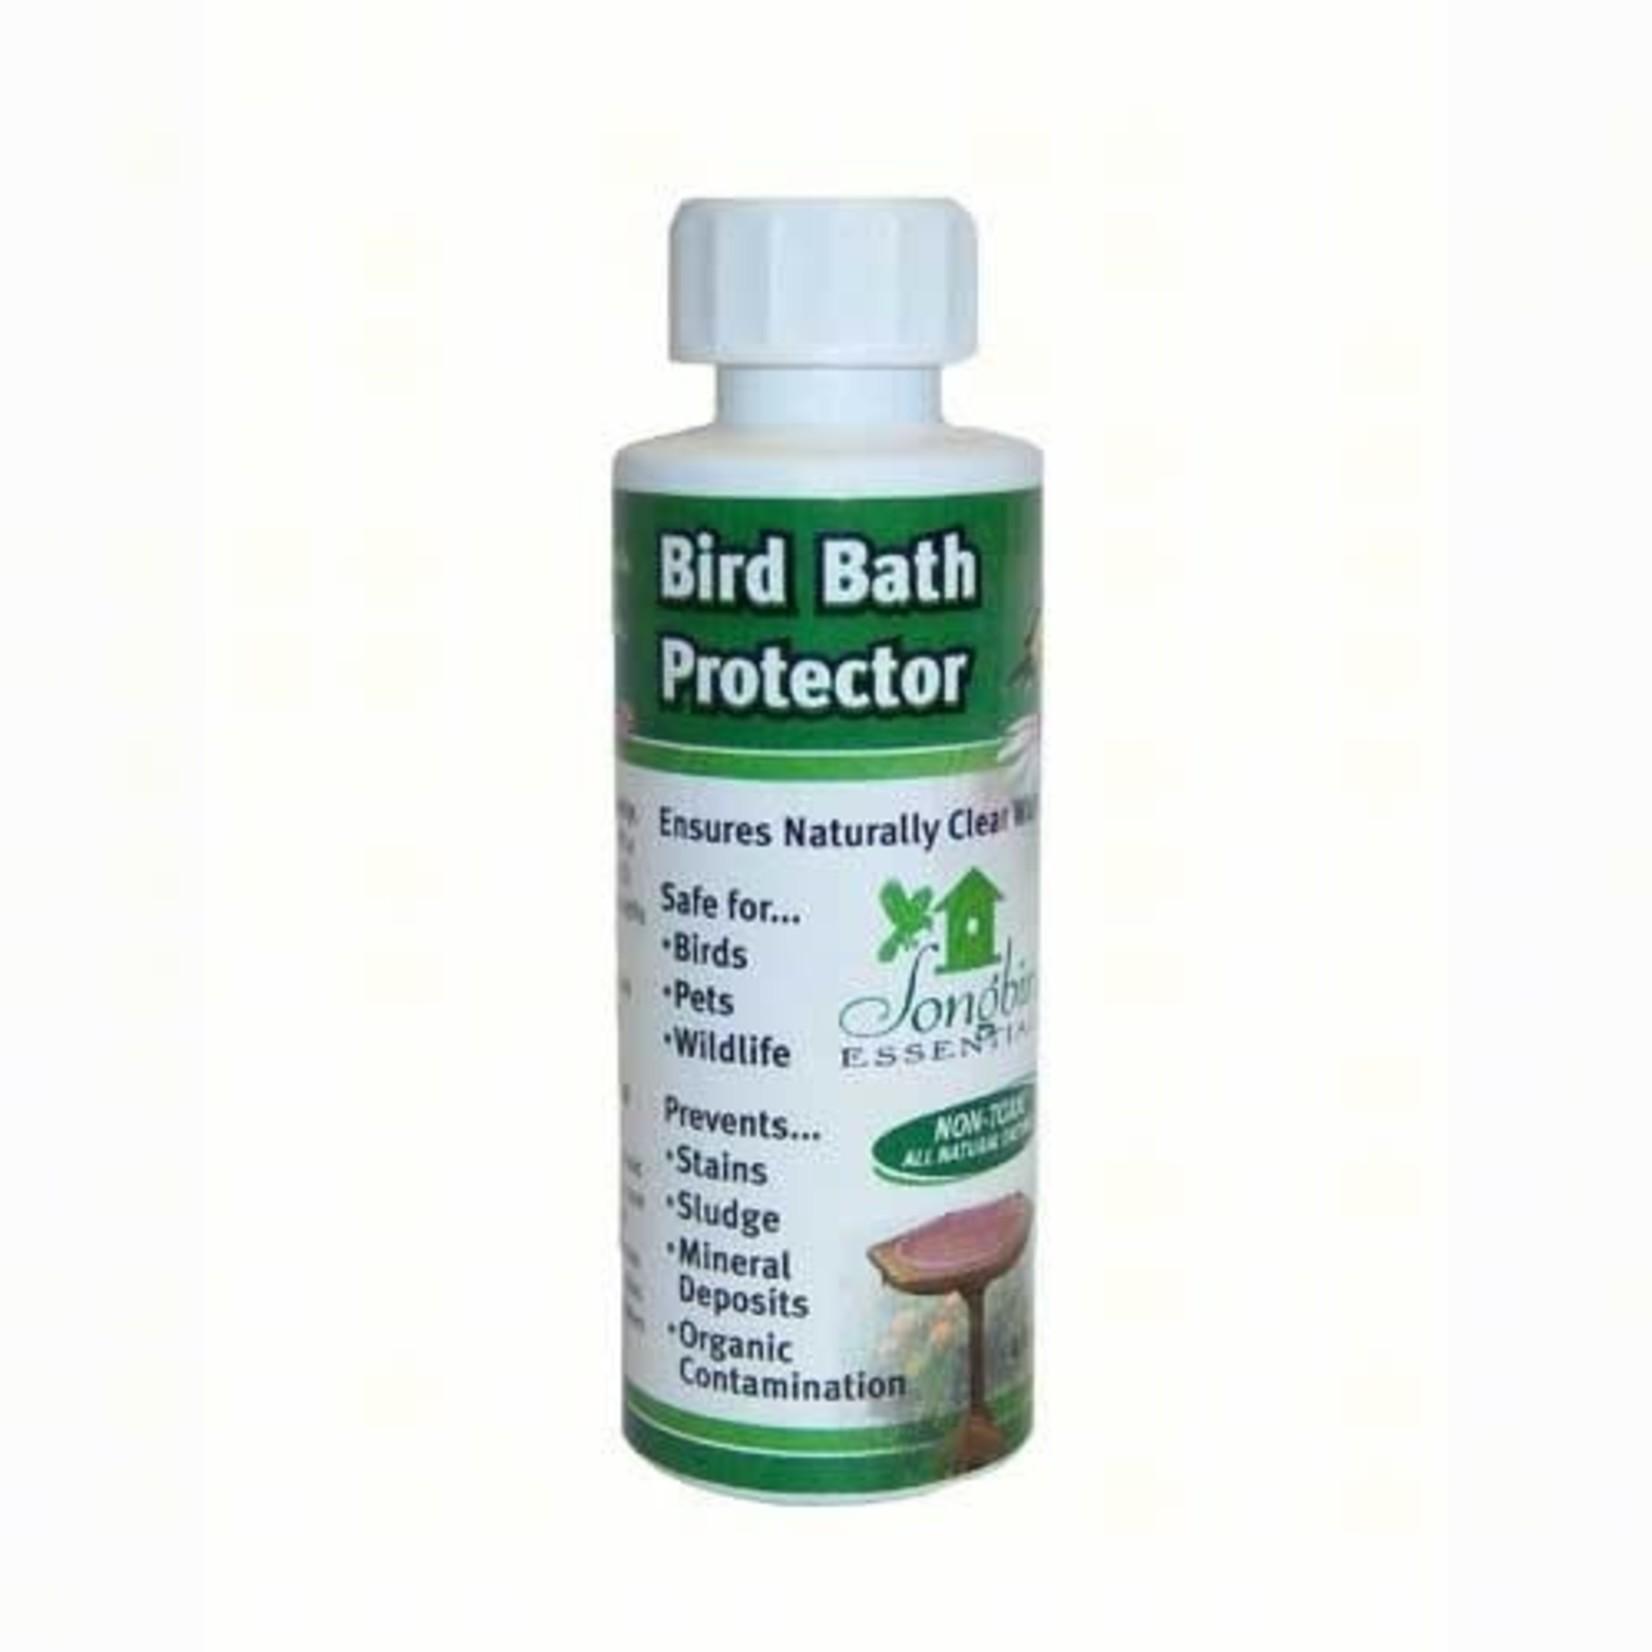 Bird Bath Protector - 4 oz